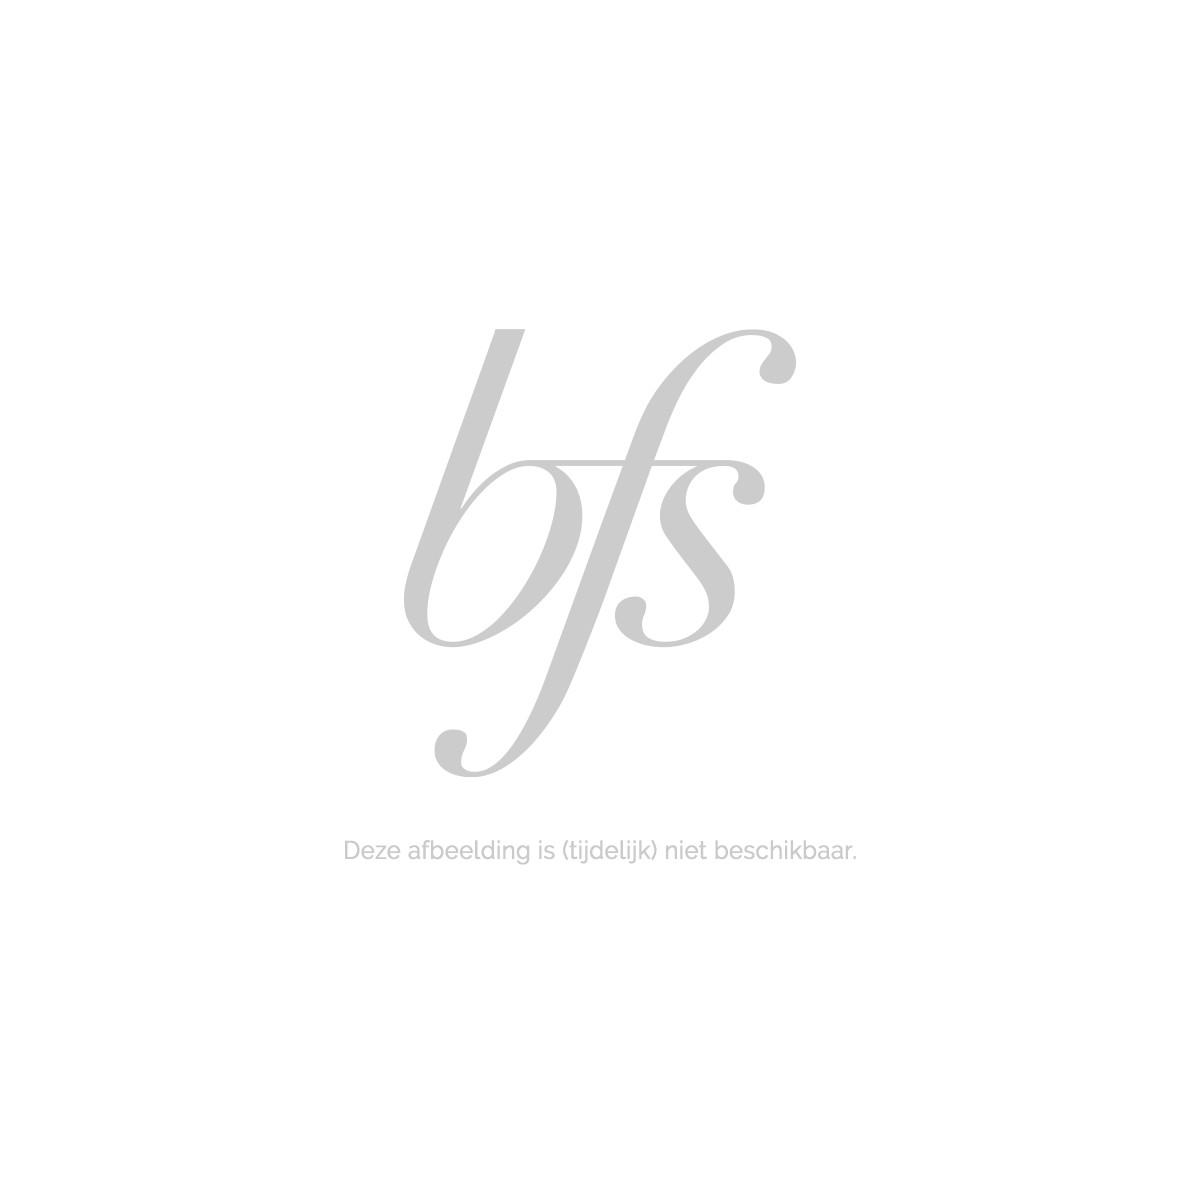 Bourjois Mascara Volume Glamour Ultra Black